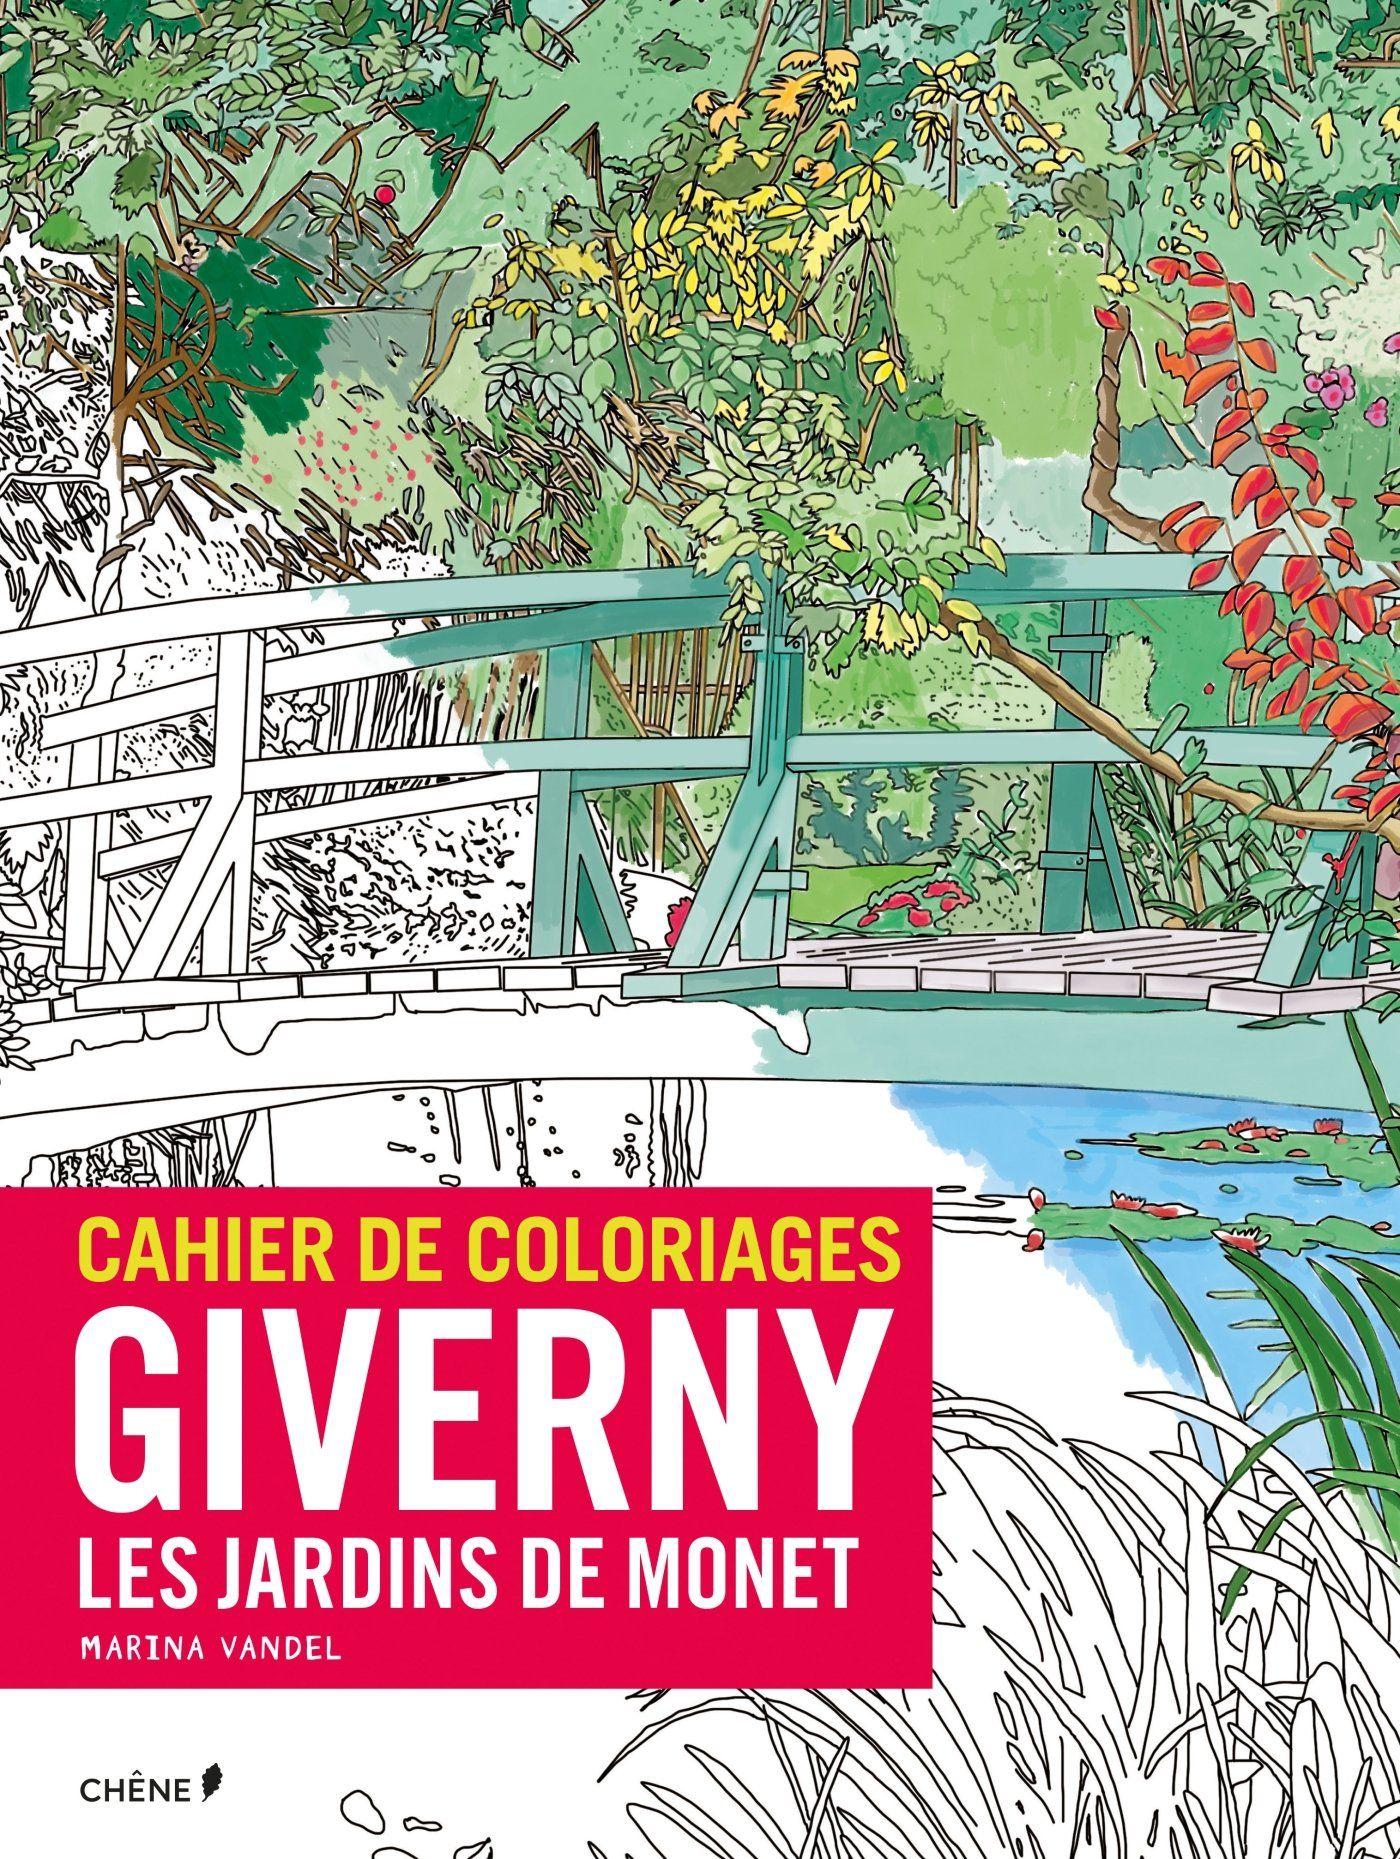 Amazon Fr Cahier De Coloriages Giverny Les Jardins De Monet Marina Vandel Cahier De Coloriage Livre Coloriage Coloriage